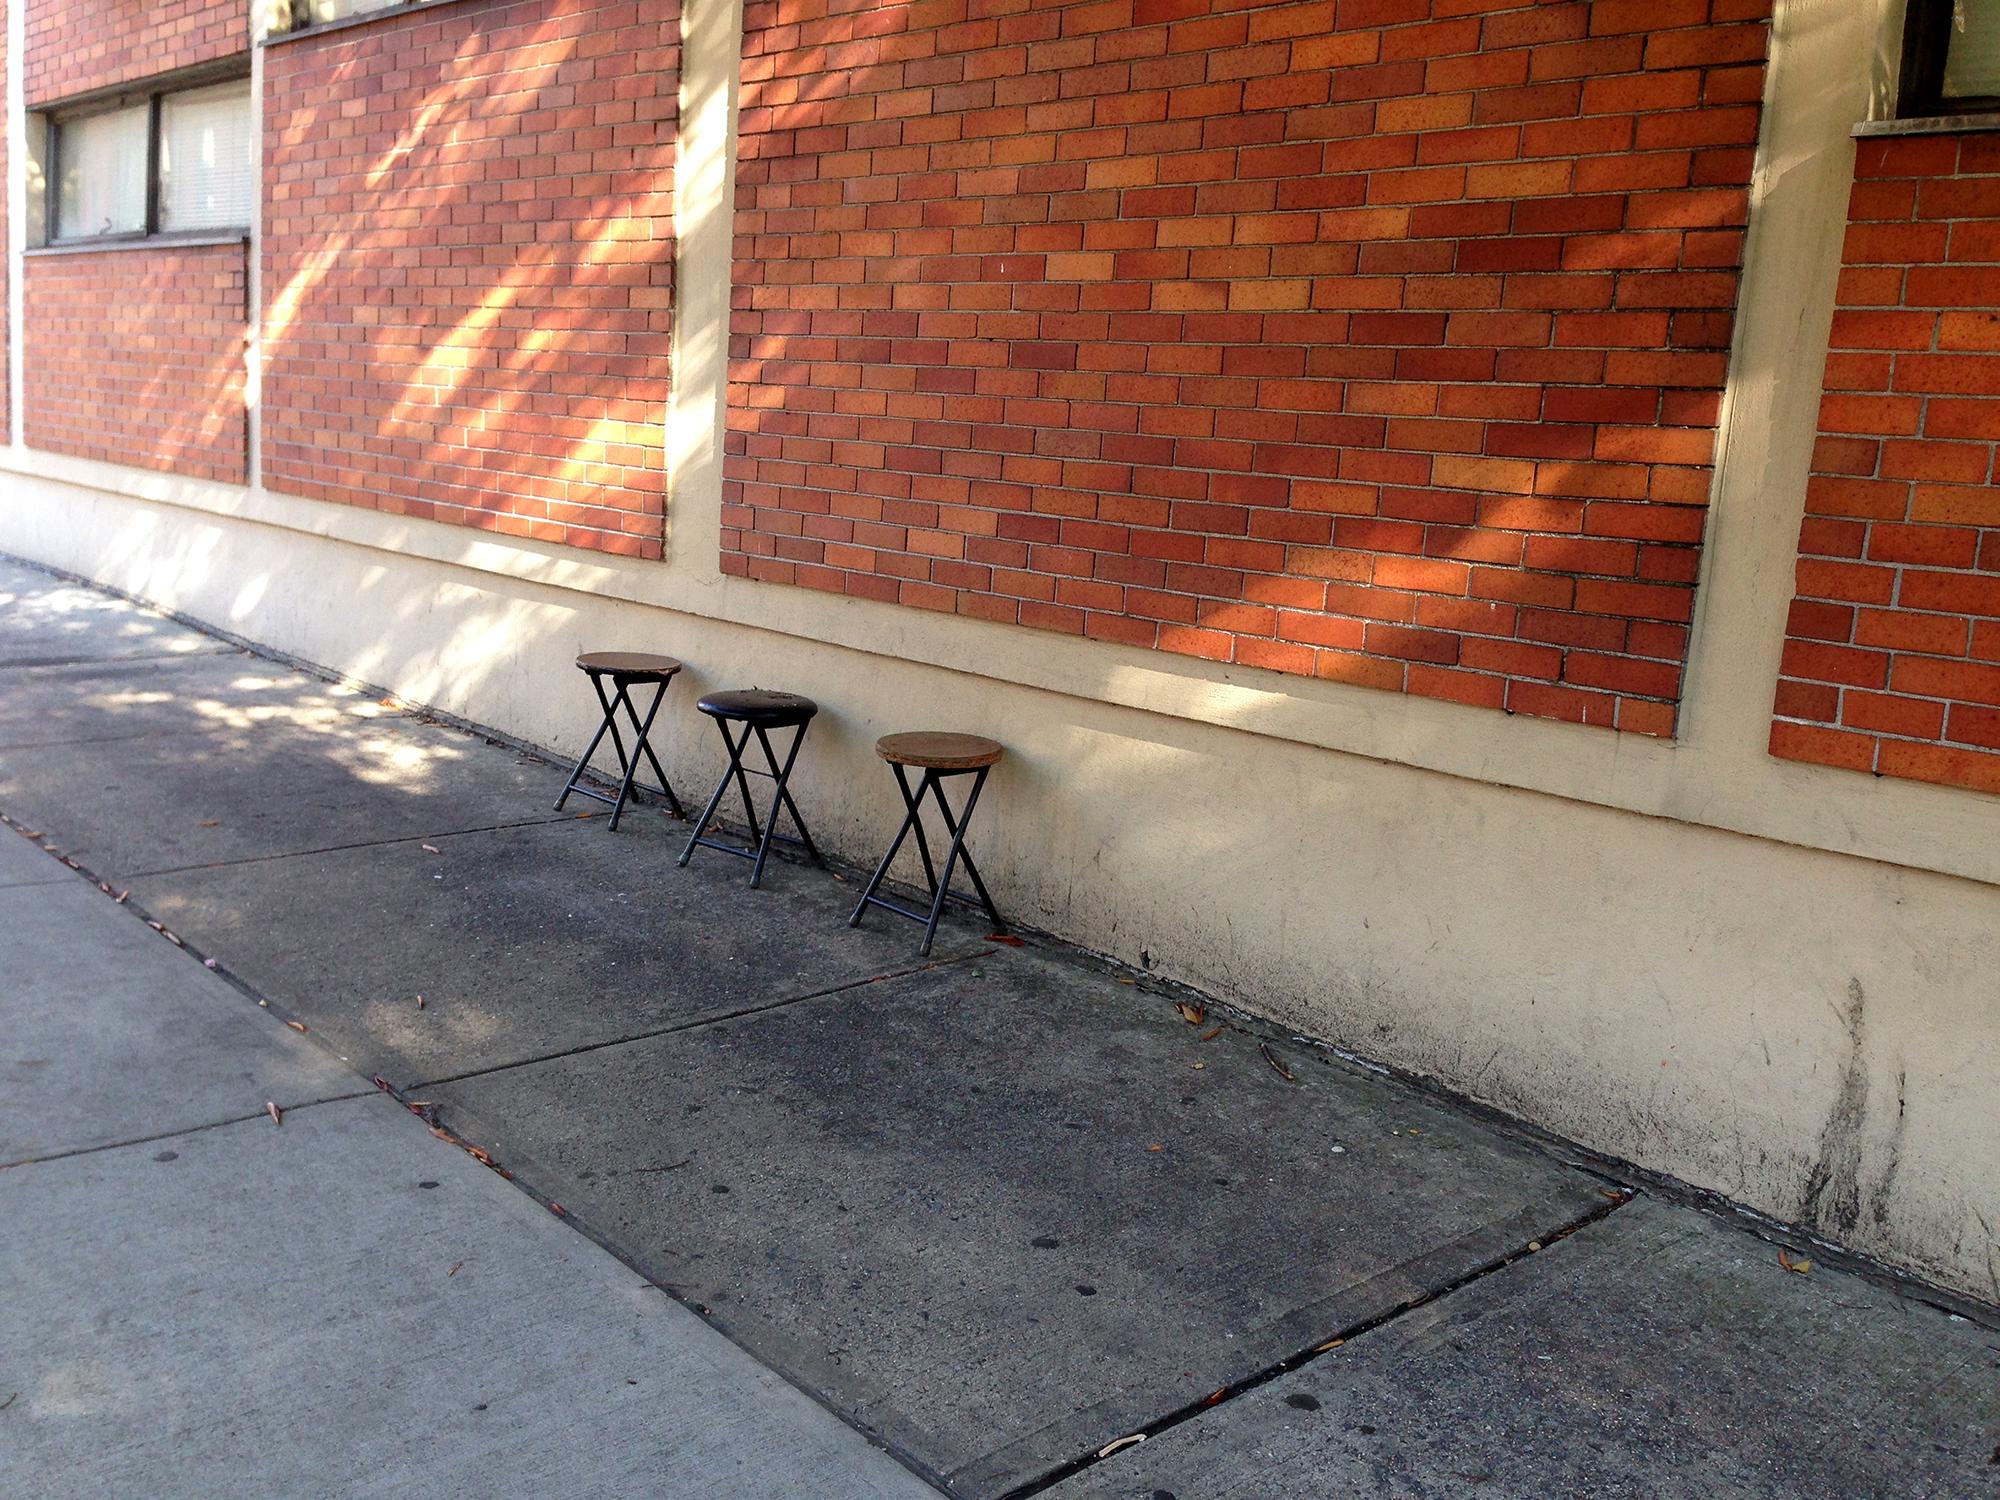 D_2014.10.StreetSeats.jpg